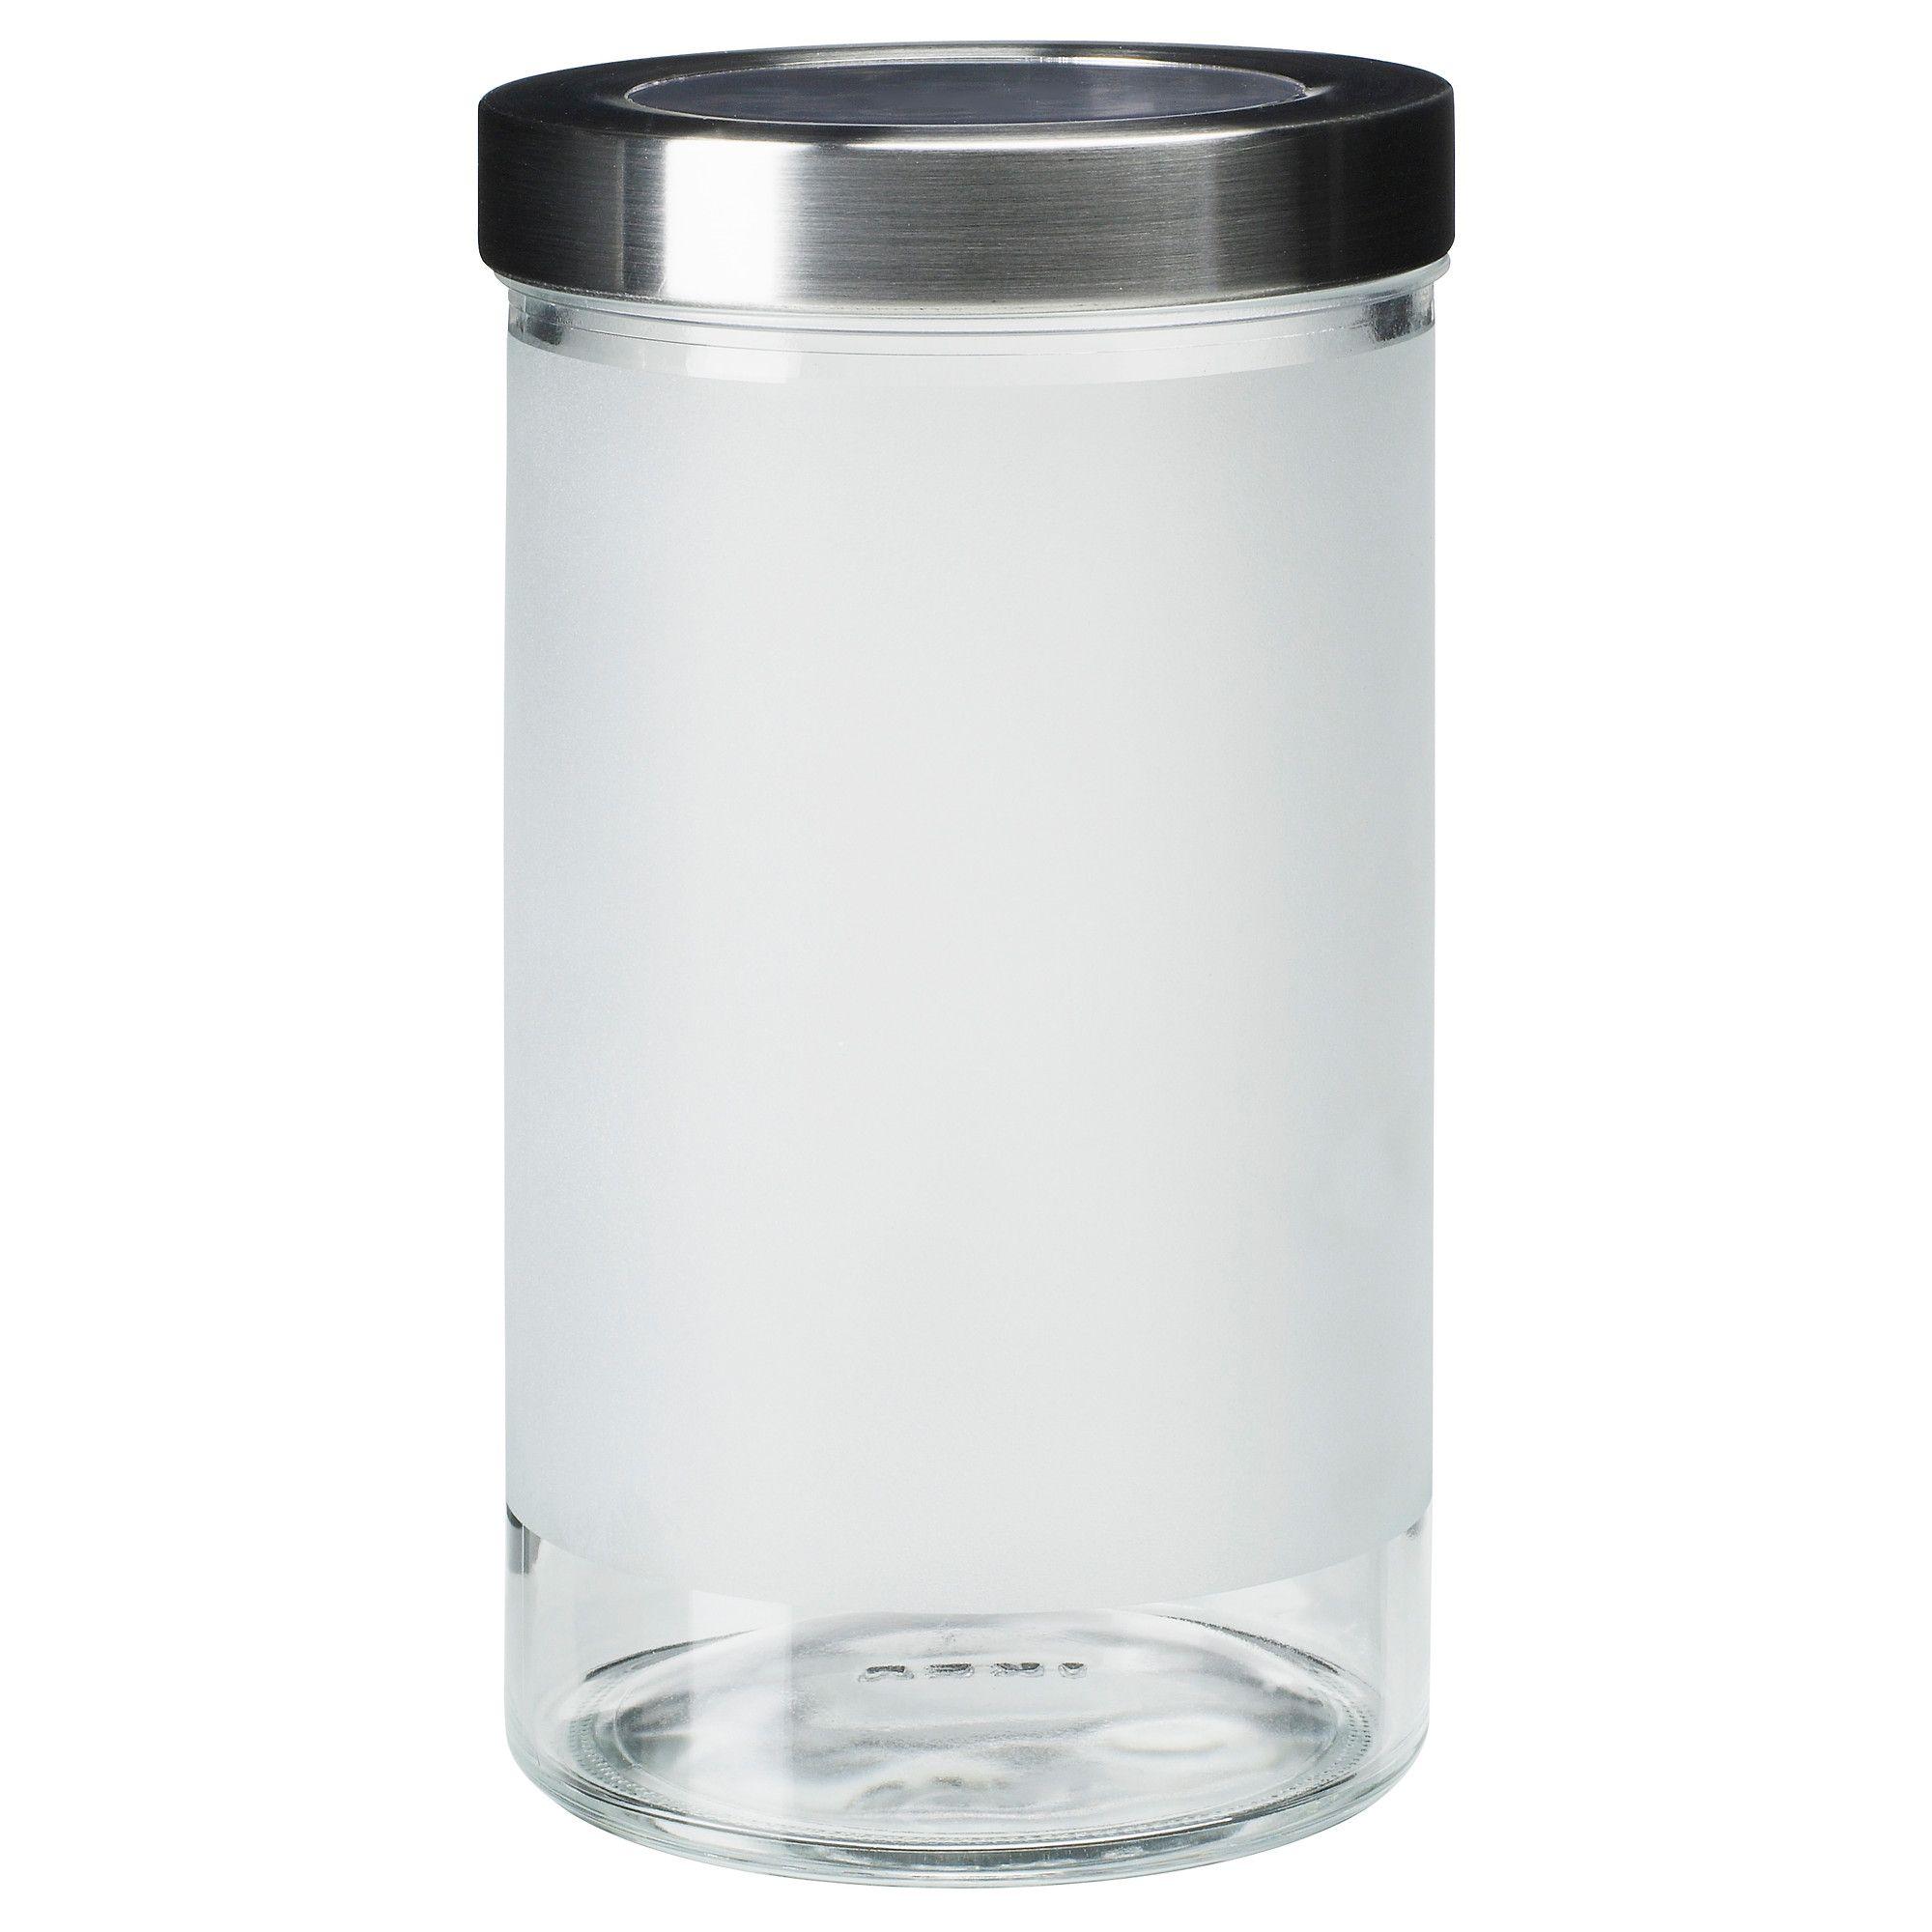 Mason Jars With Handles Ikea Google Search Mason Jars With